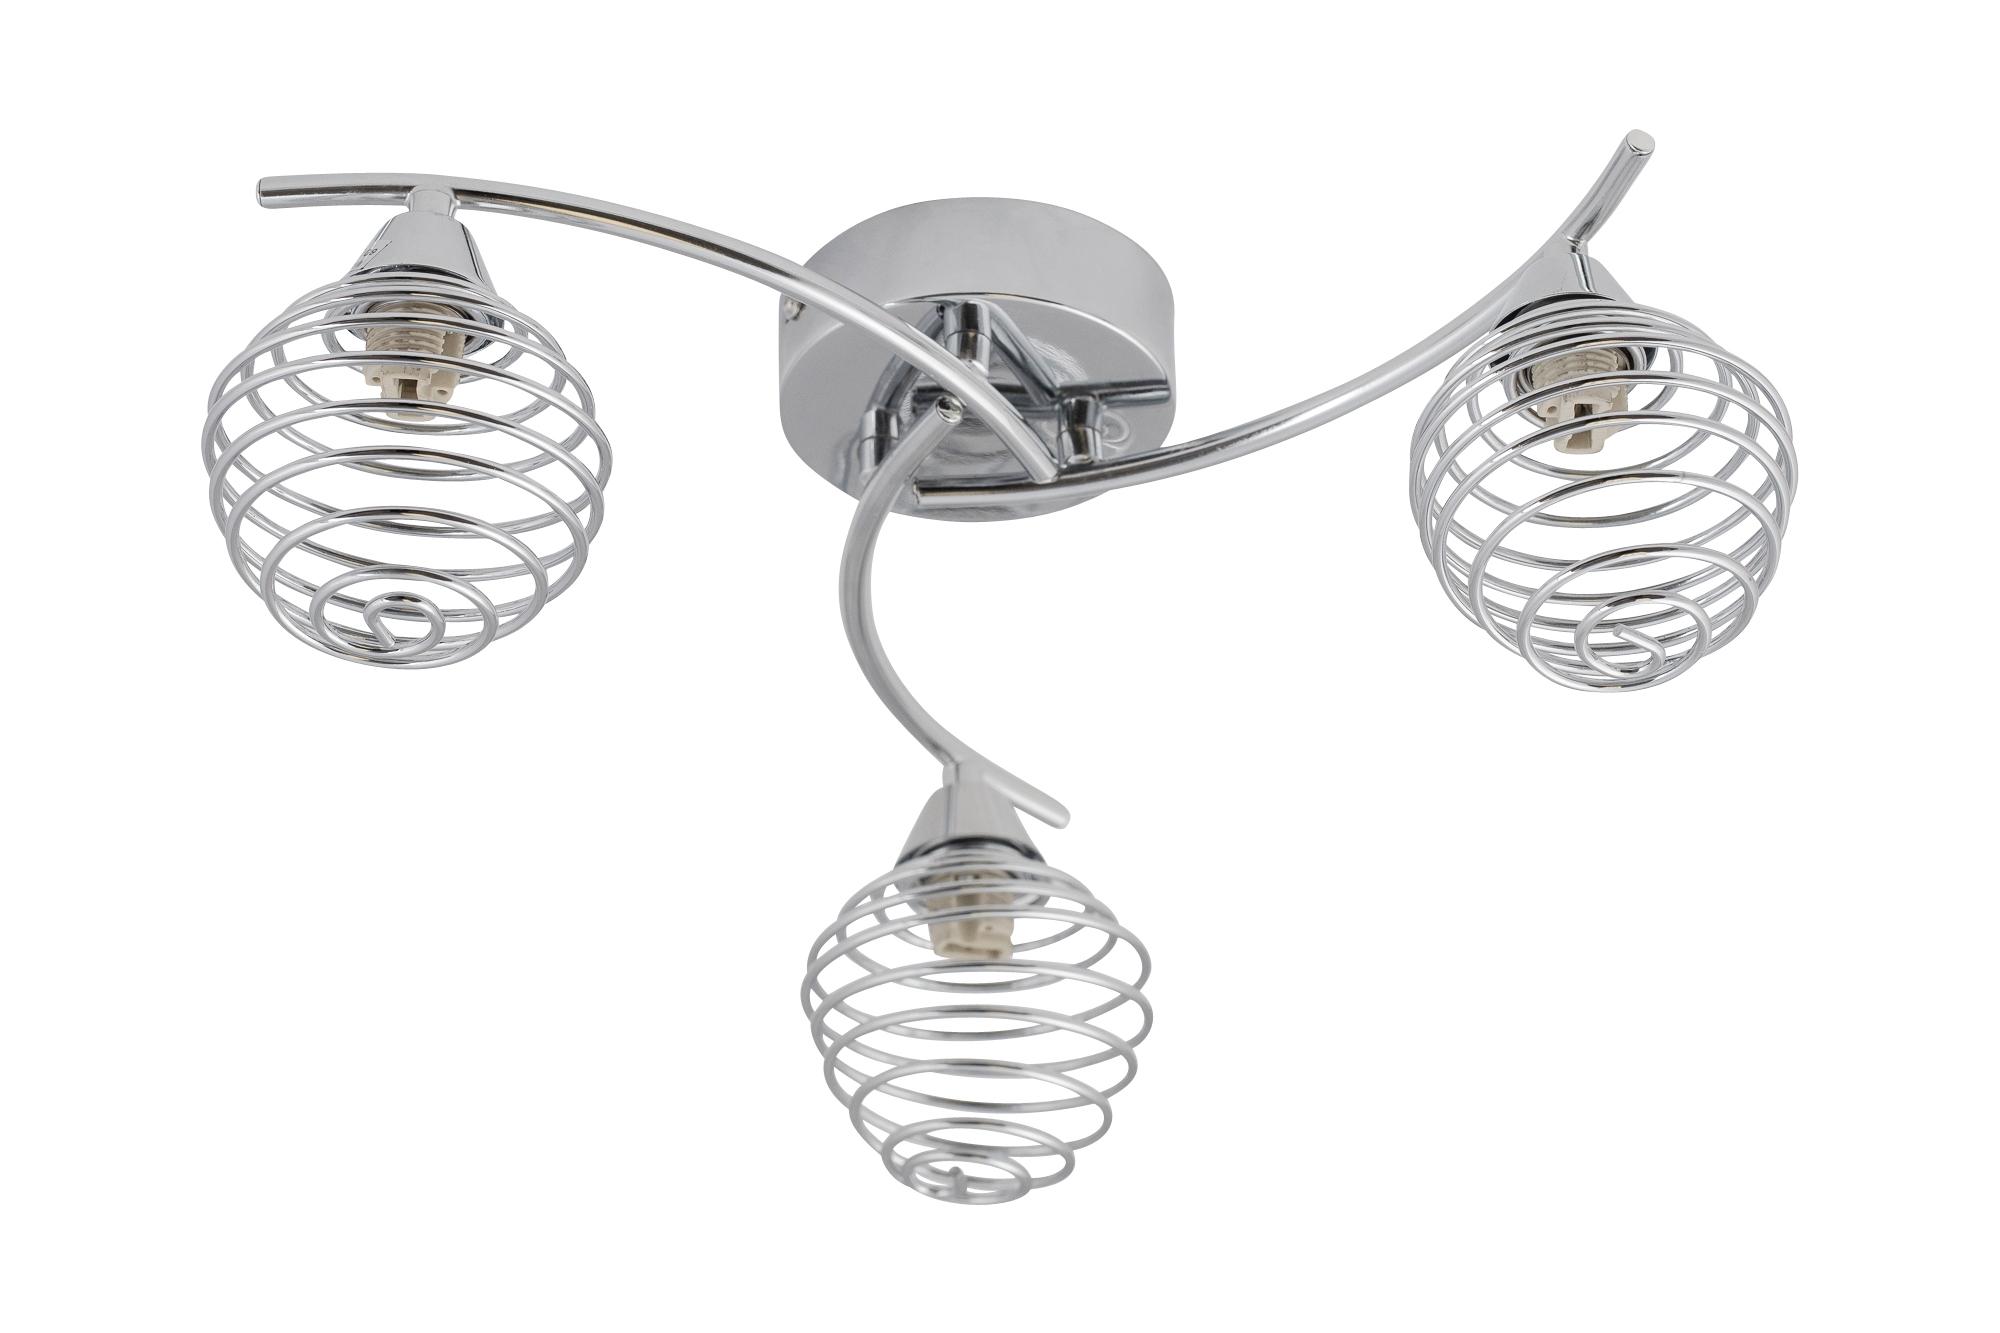 Modern Led Bathroom Ceiling Light Chrome Finish Ip44 Rated: Modern Polished Chrome 3 Way Twist Flush Ceiling Light